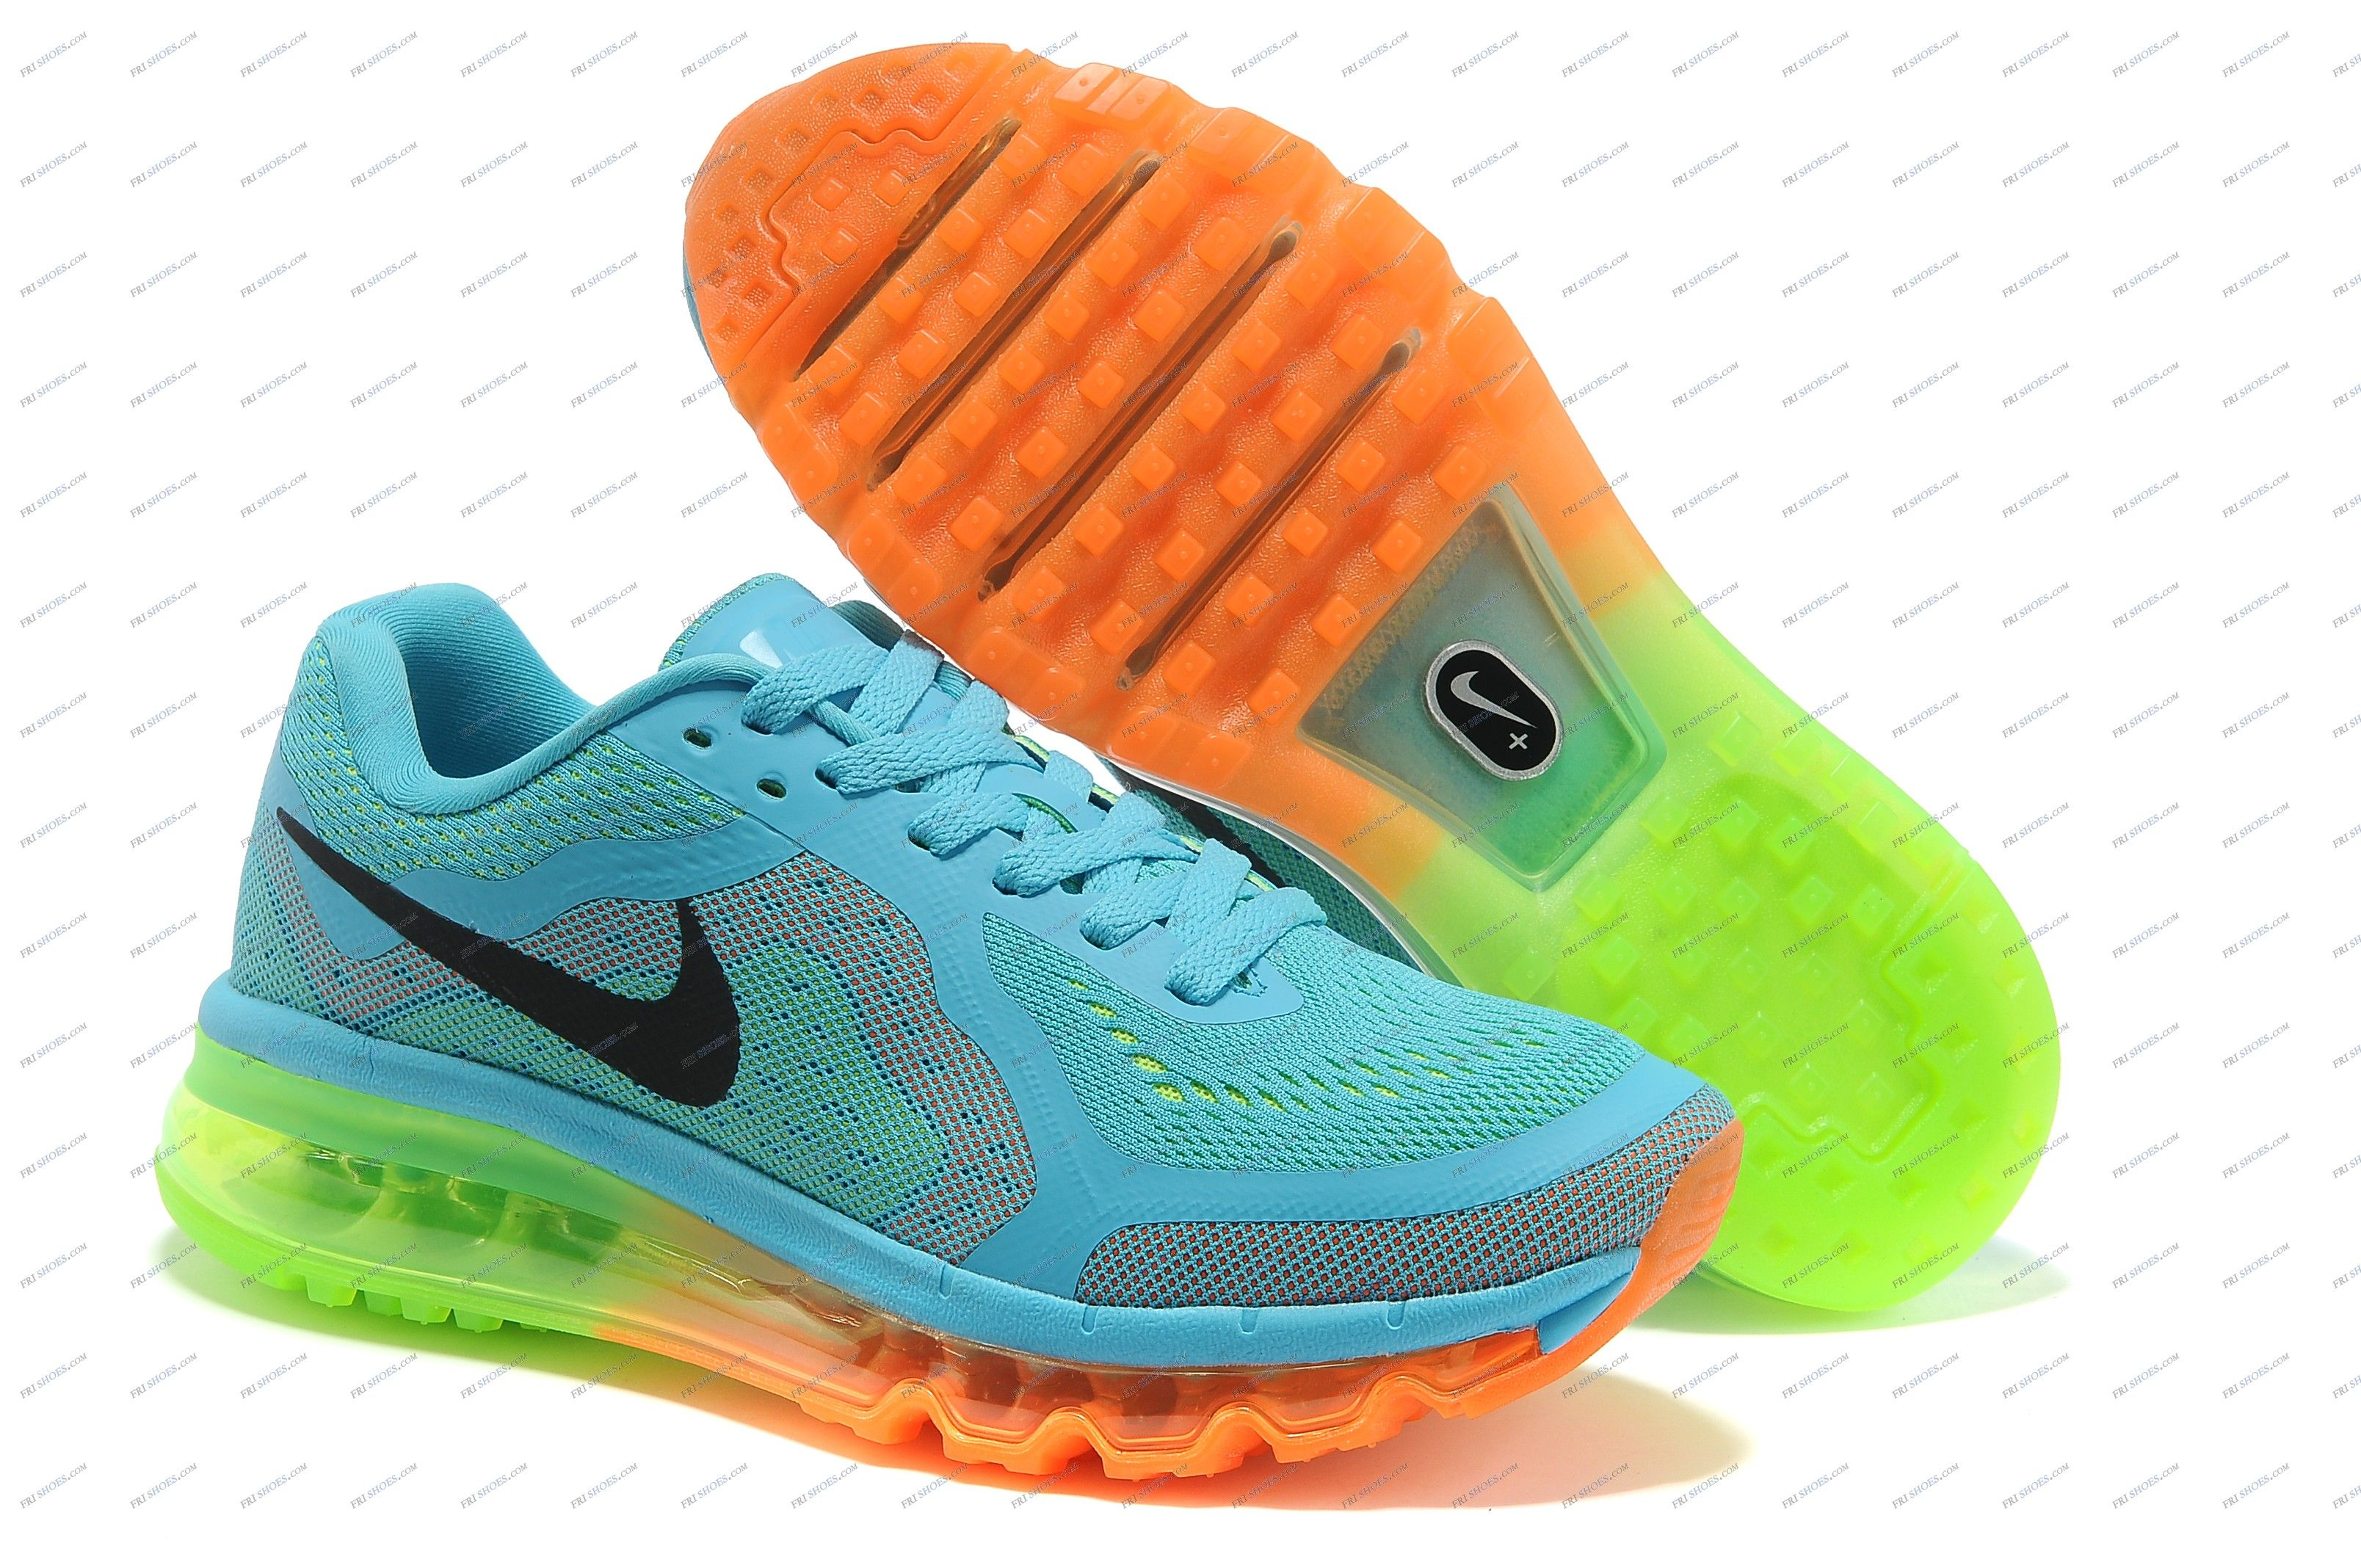 buy online 26ee4 e8da7 Nike Air Max 2014 Sky Blue Orange Women s Athletics Running shoes nike  online shop